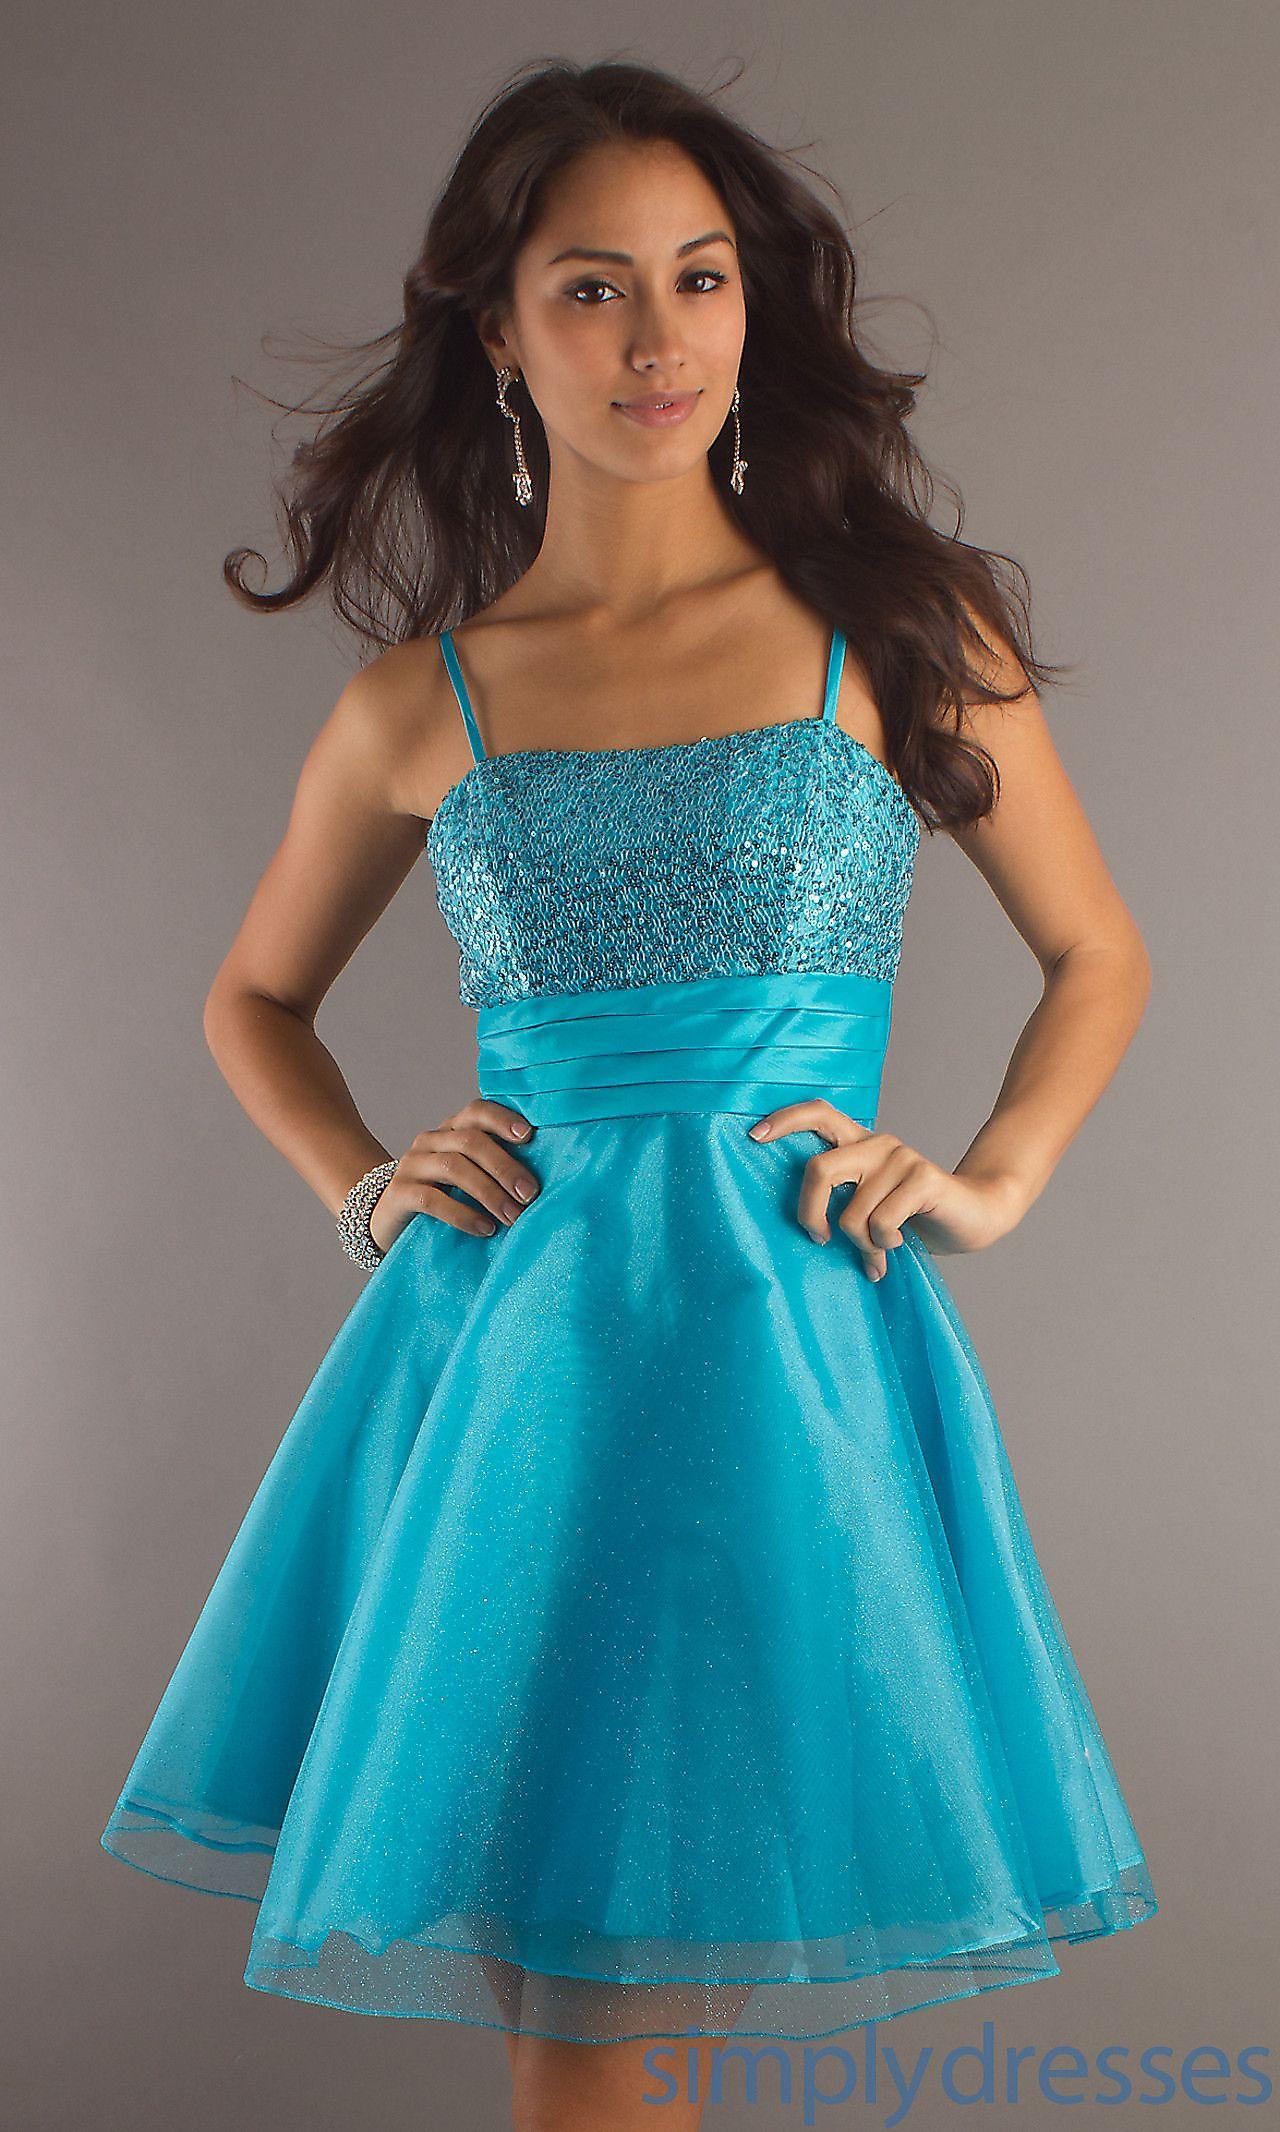 Short Spaghetti Strap Dress DQ-7730f | Party dresses | Pinterest ...